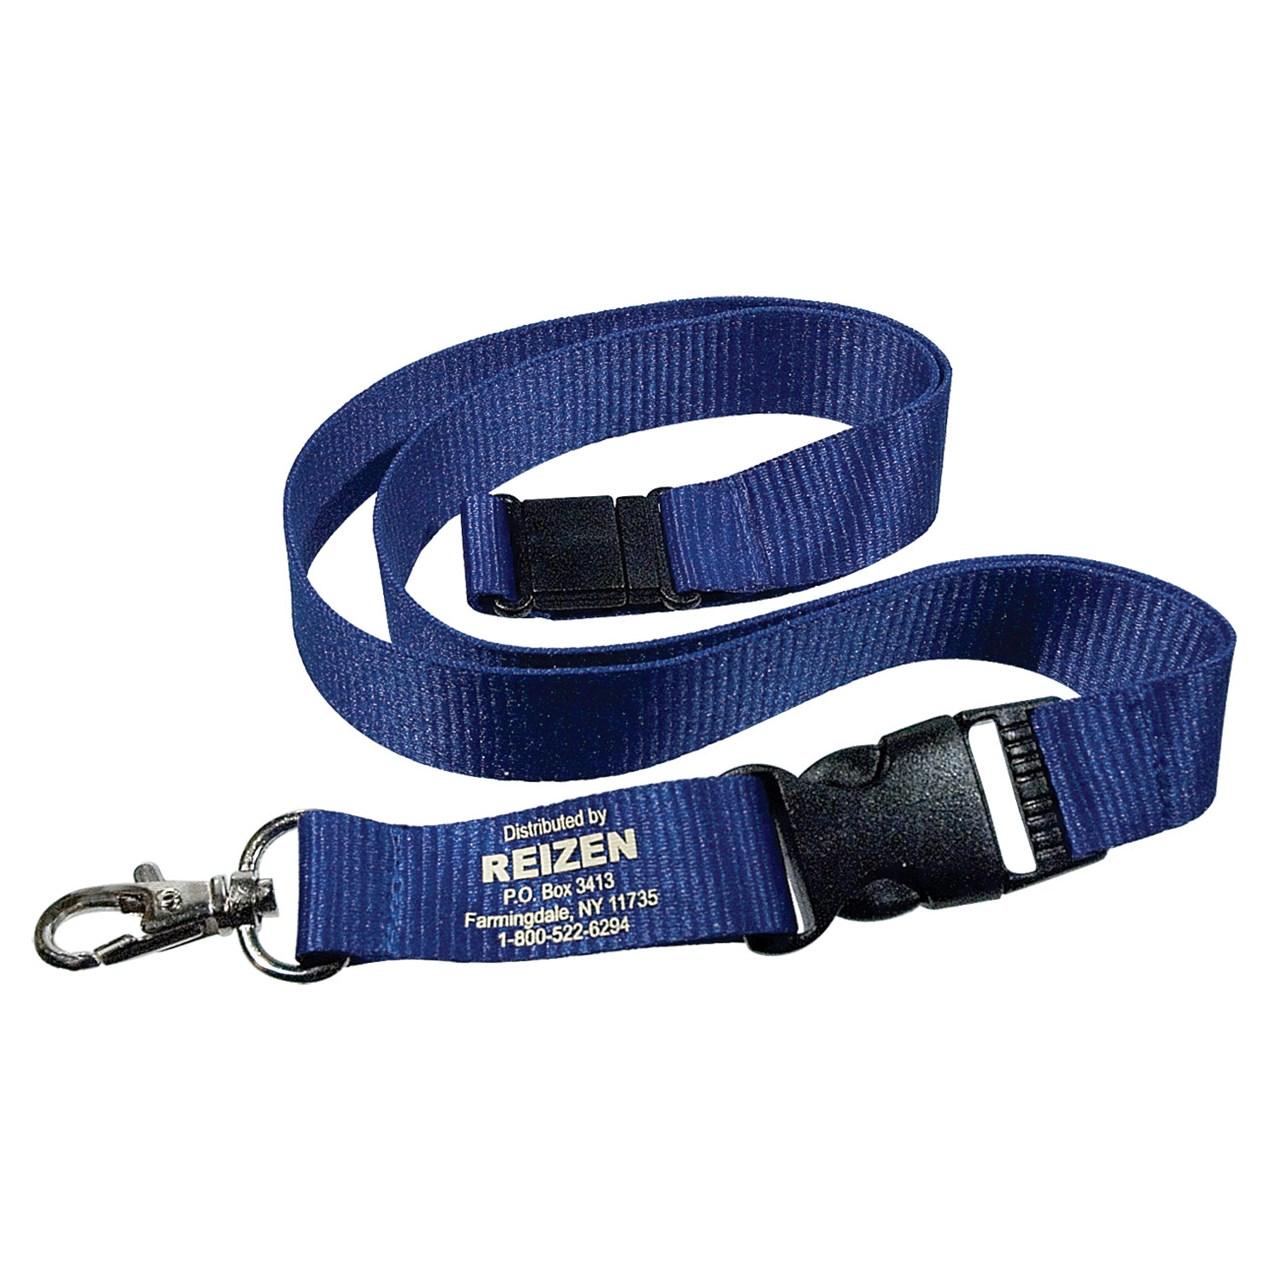 Reizen Break-Away Blue Polyester Lanyard - 36 inch Long